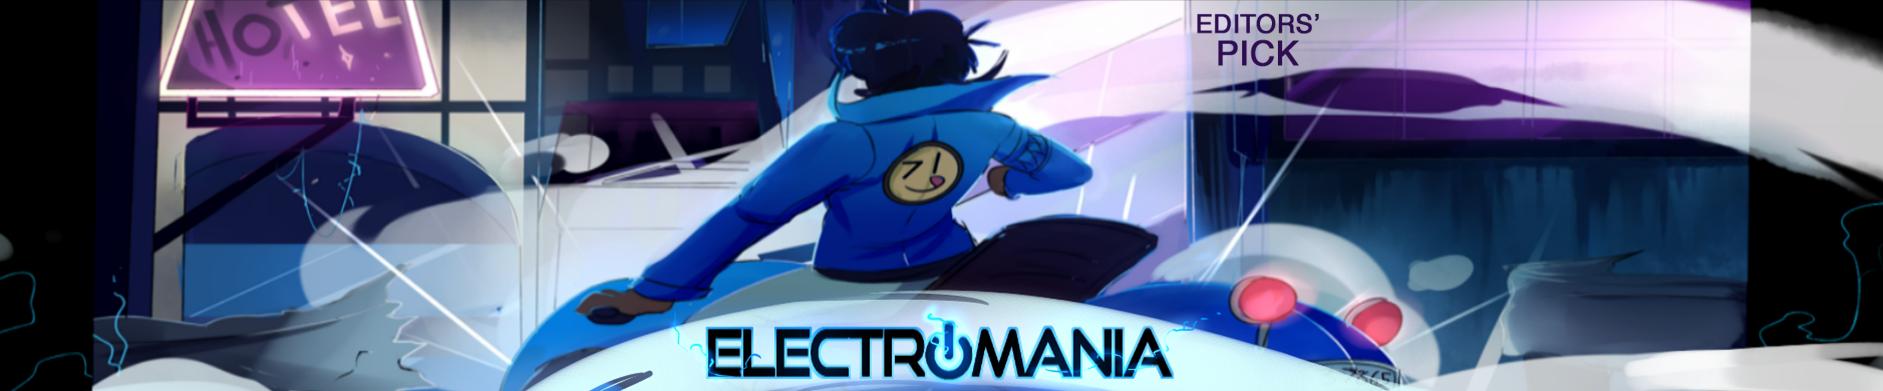 DratiniMartini's - Electromania